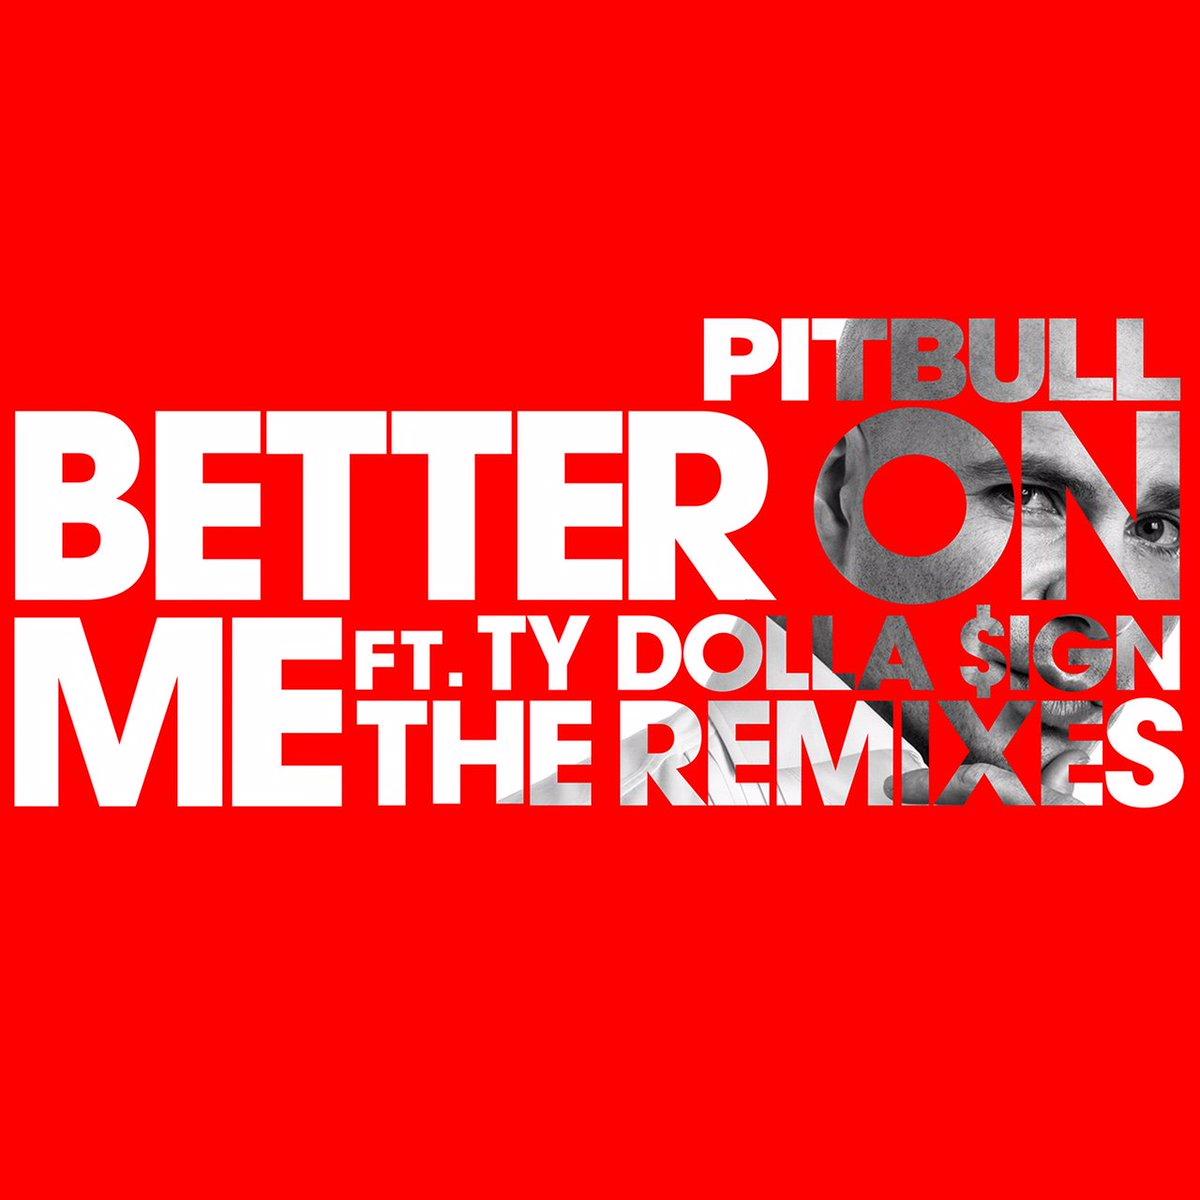 Check out this remix for #BetterOnMe Ft @tydollasign https://t.co/4kaVqCjpaS https://t.co/dUH7l7z3WB